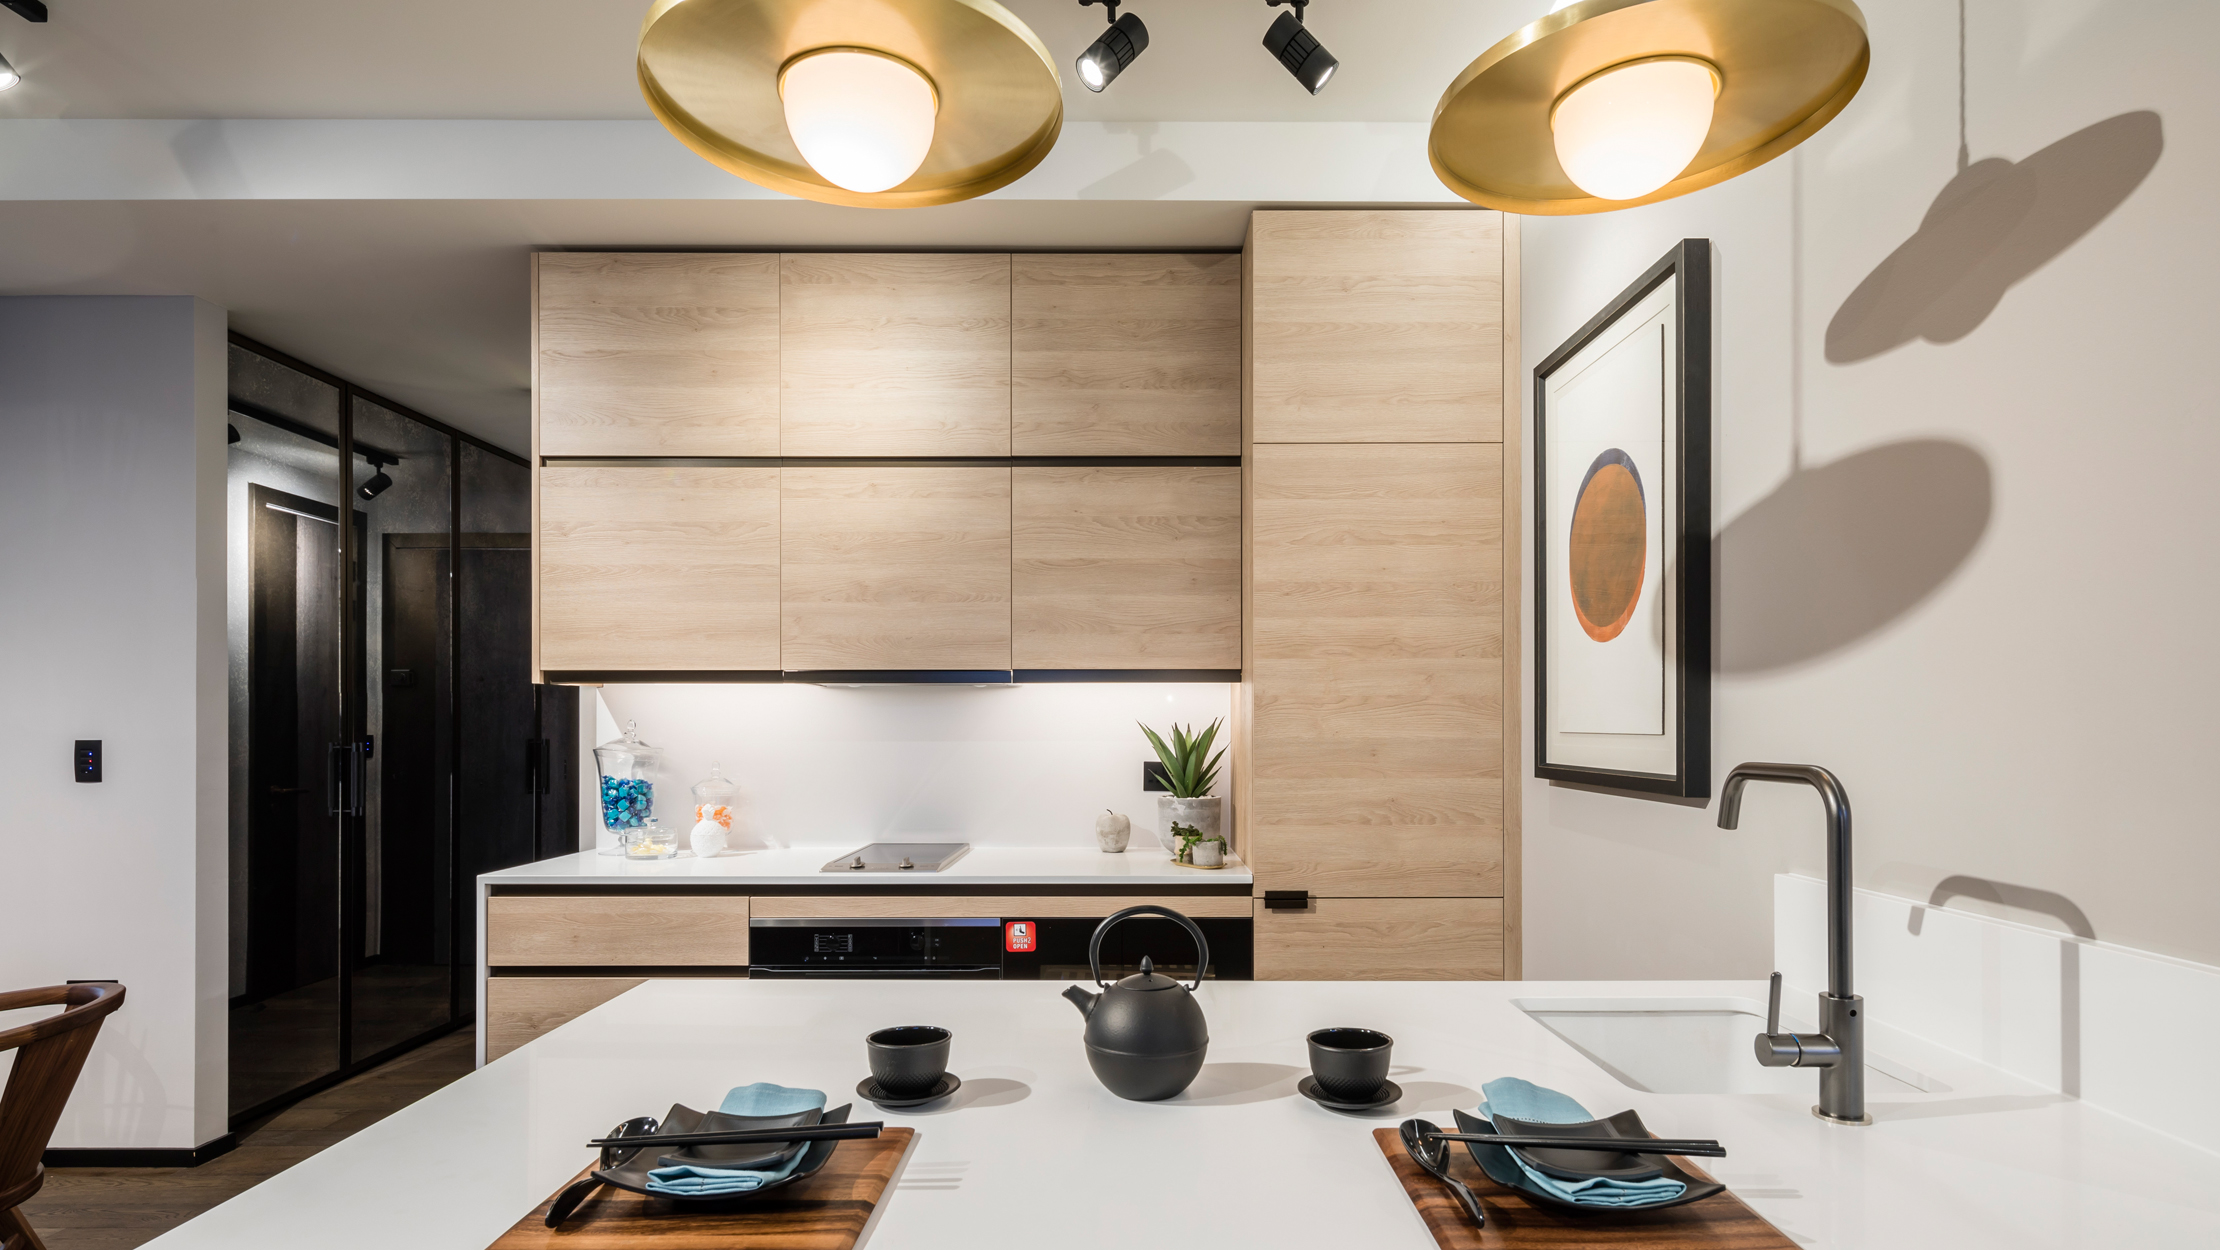 Studio Flats for Sale London | Galliard Homes